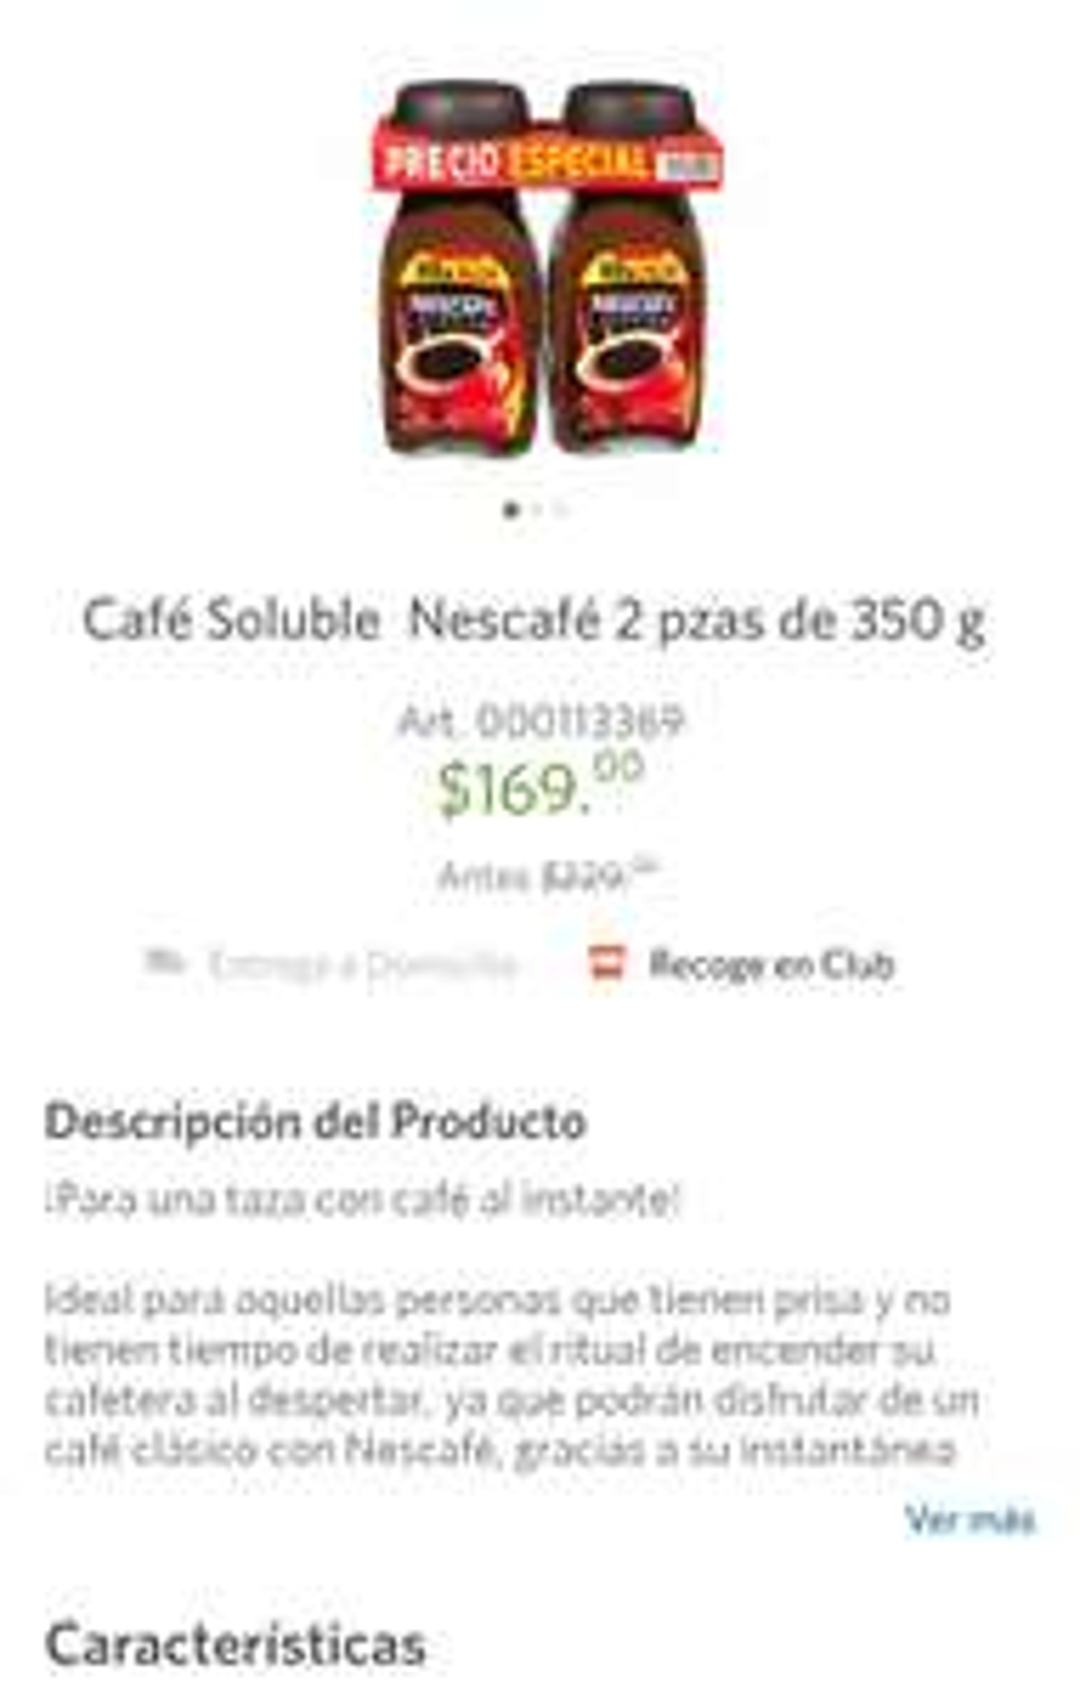 Sam's Club: Cafe soluble Nescafé 2 piezas x $169